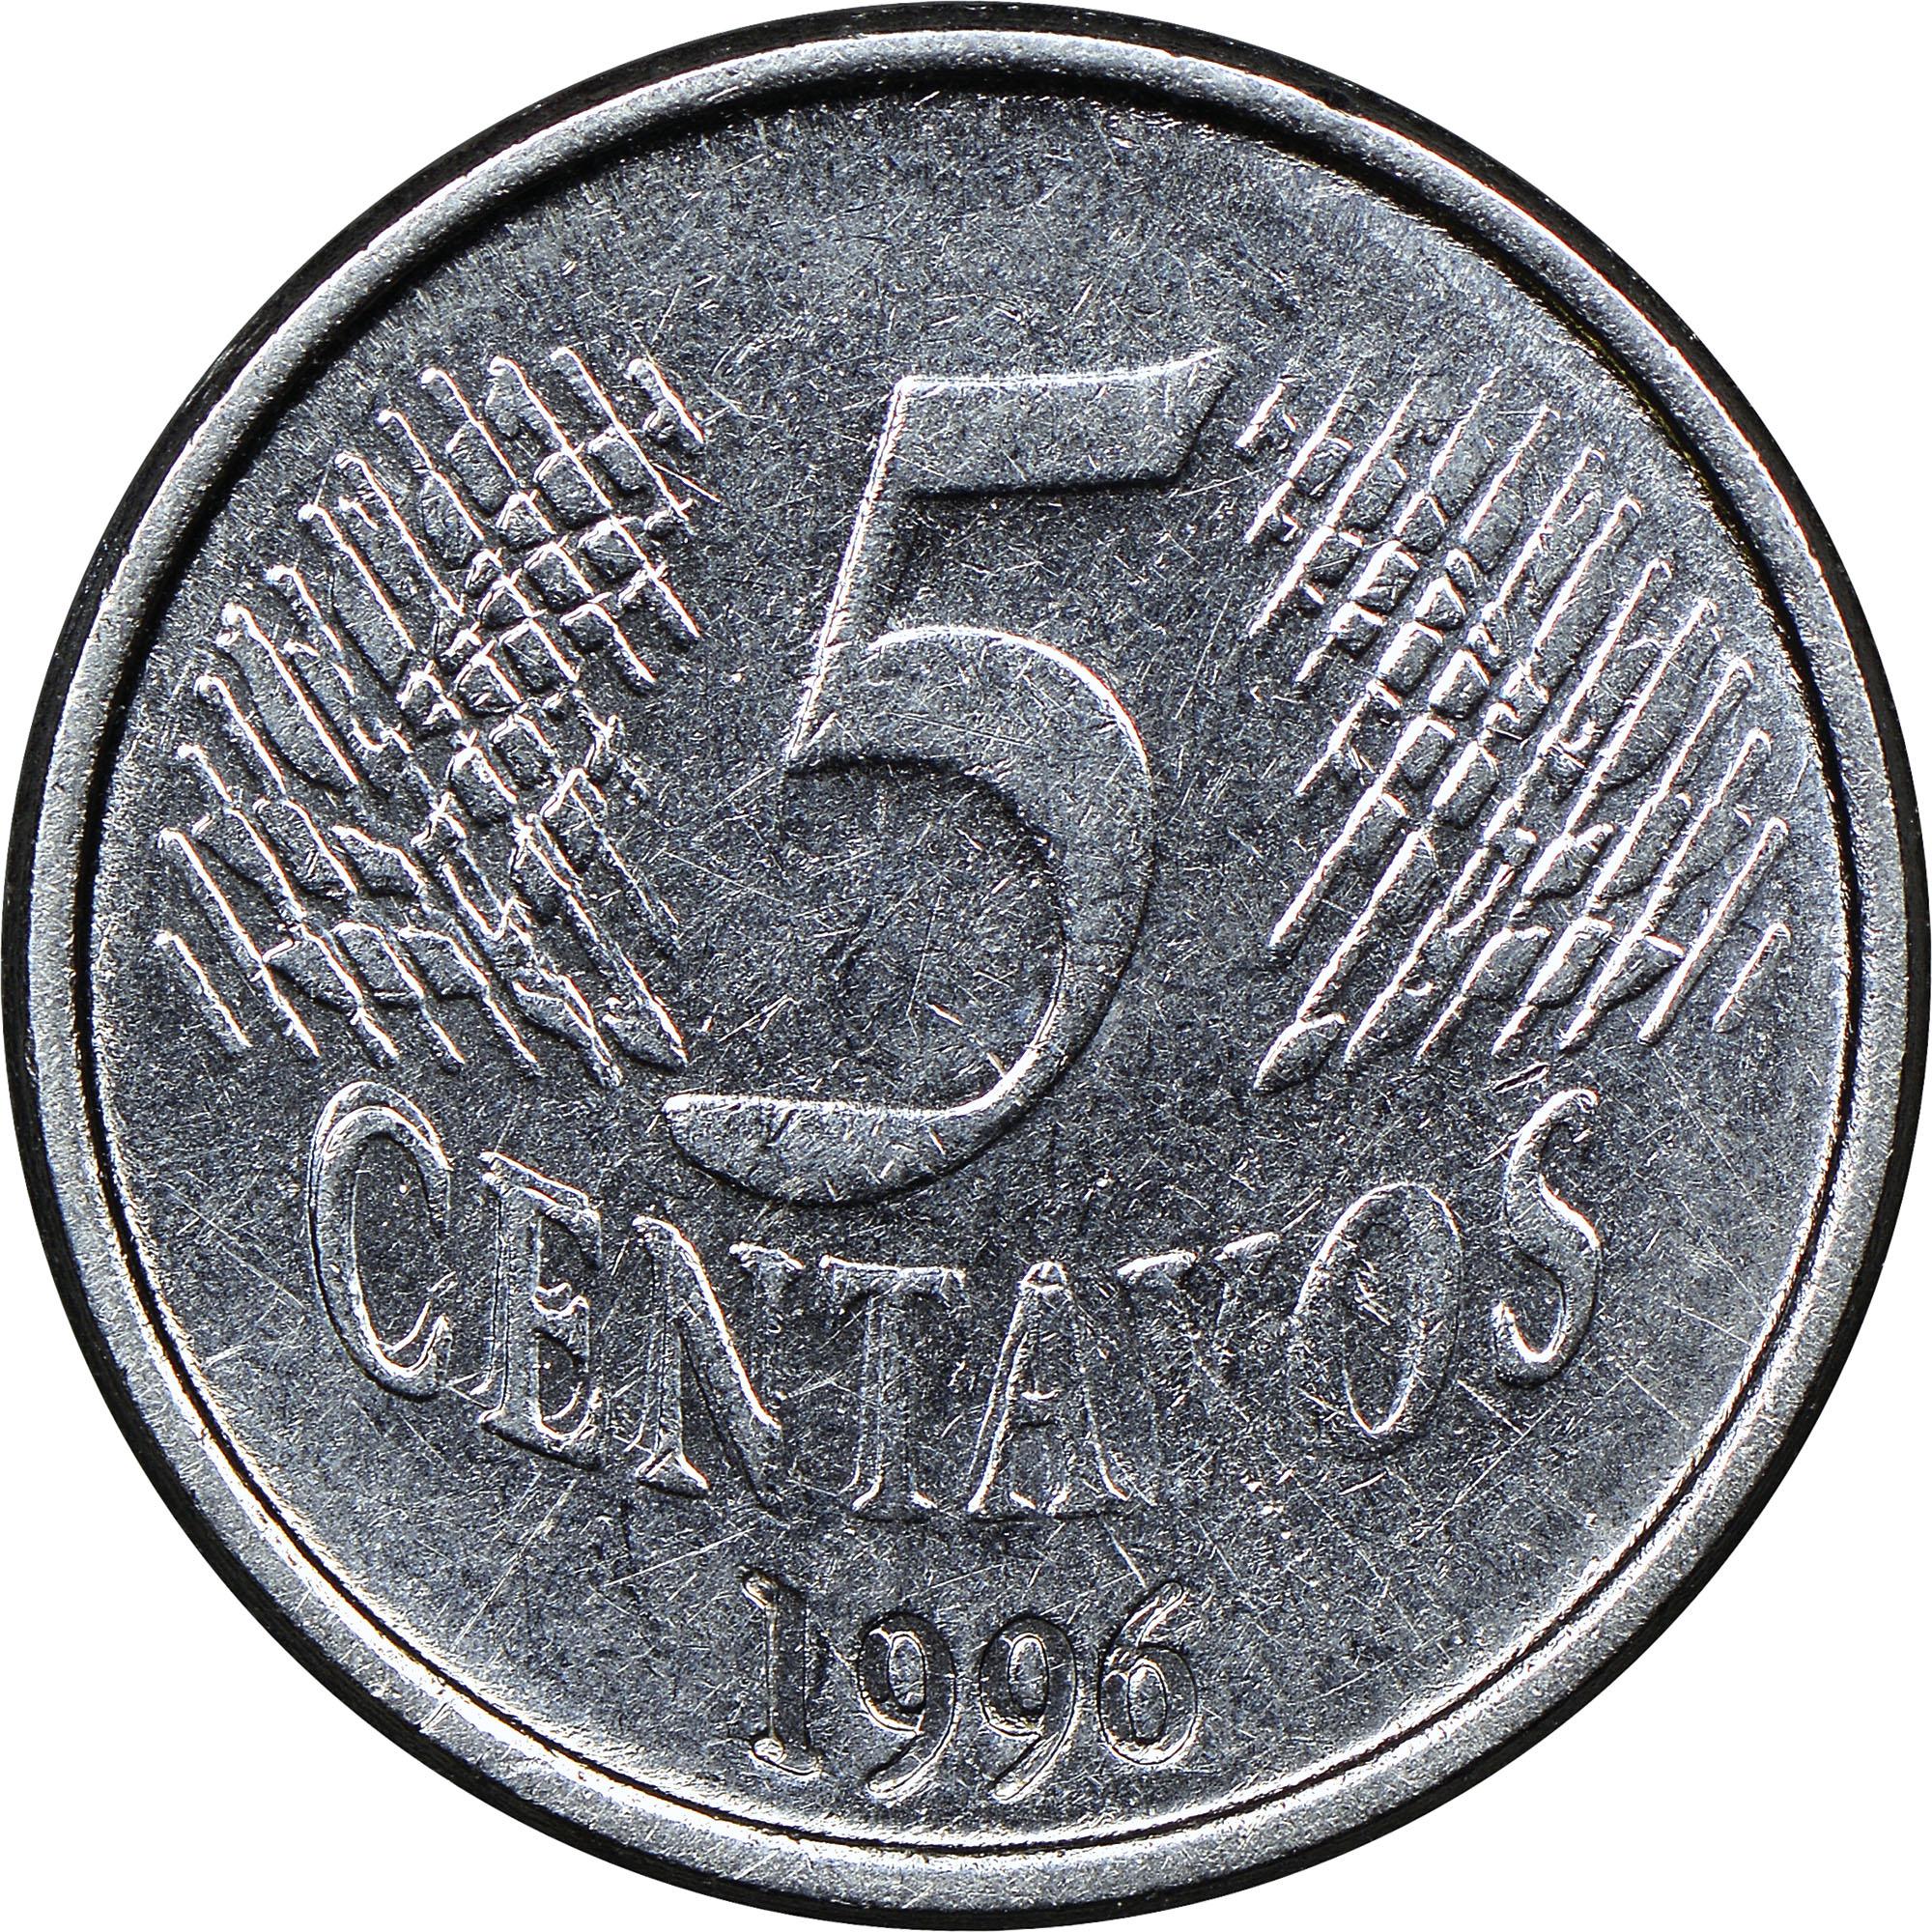 Brazil 5 Centavos reverse